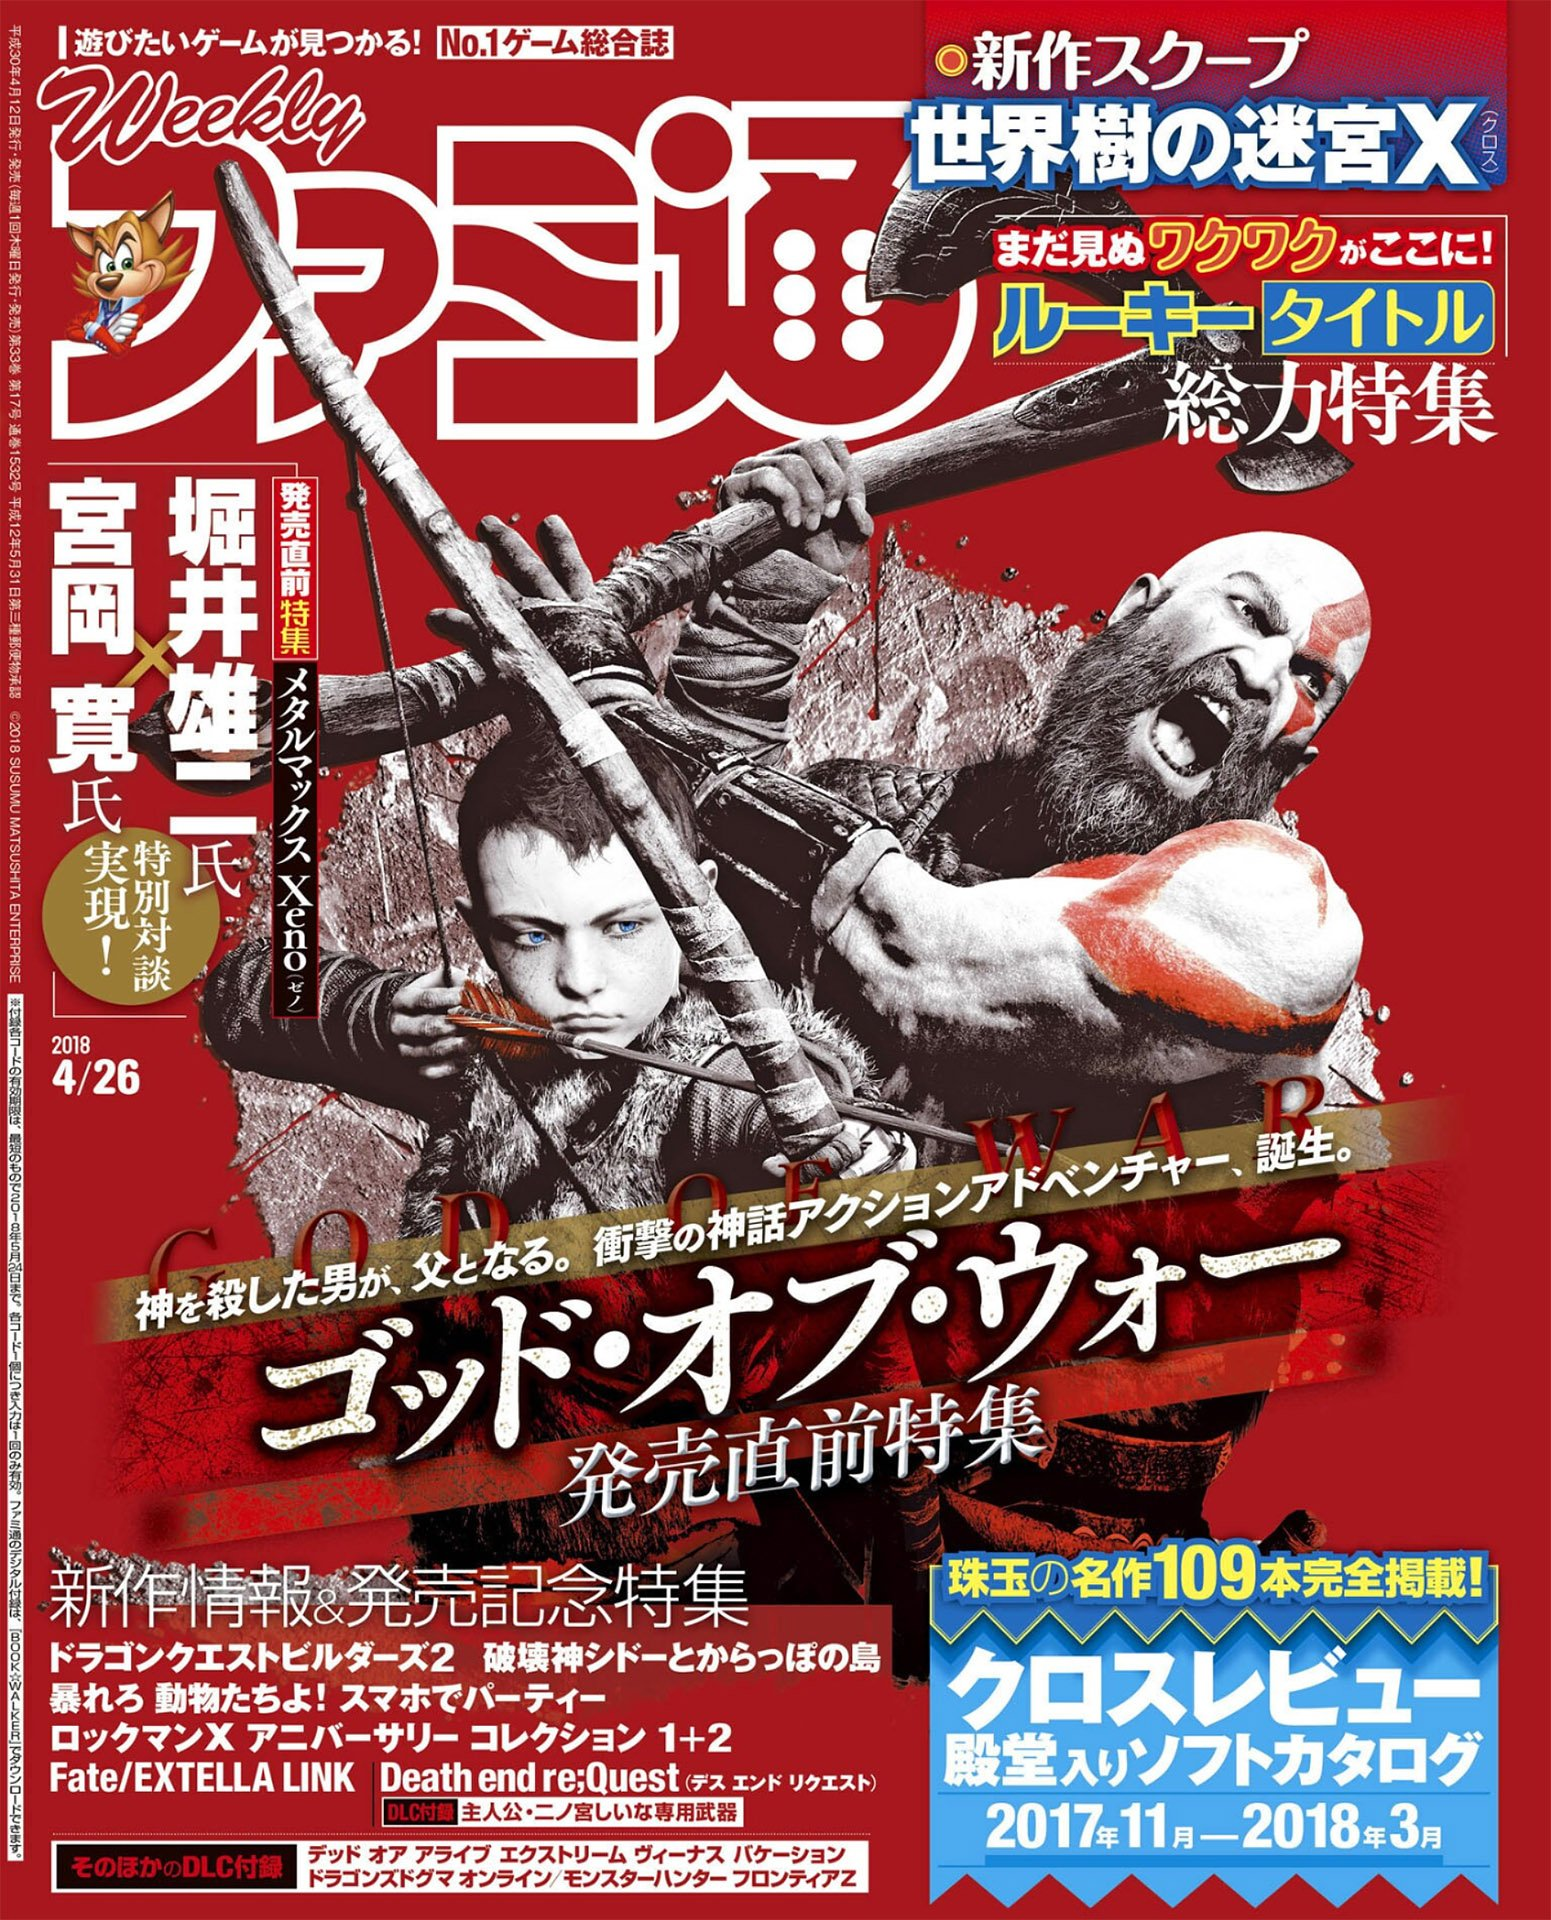 Famitsu 1532 (April 26, 2018)